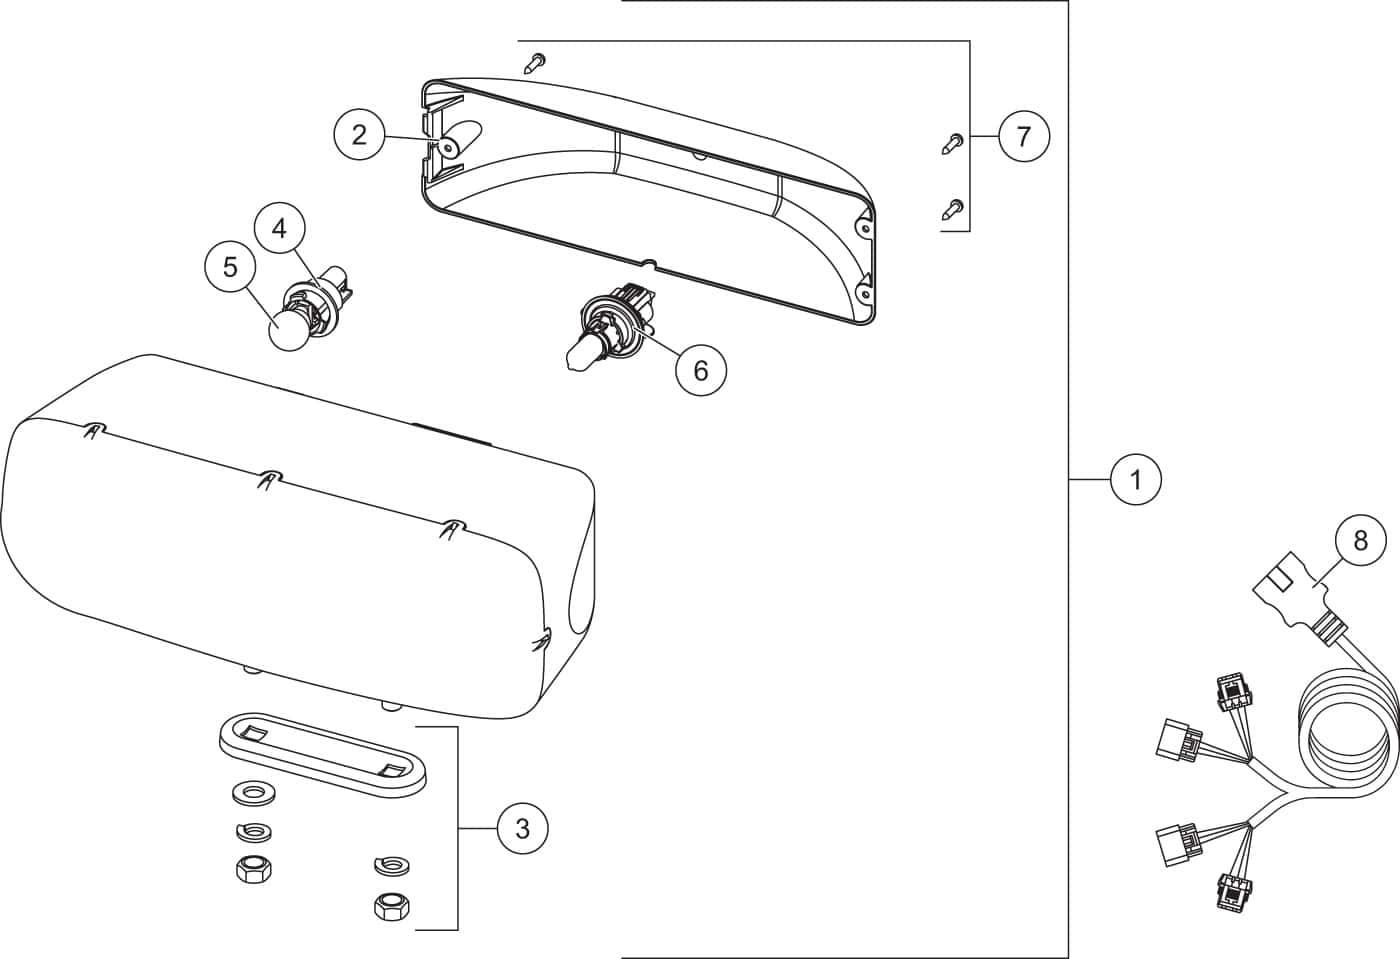 xv2hlk?resize\\\=665%2C456\\\&ssl\\\=1 1206 controller wiring diagram controller cable, controller curtis 1206 wiring diagram at n-0.co